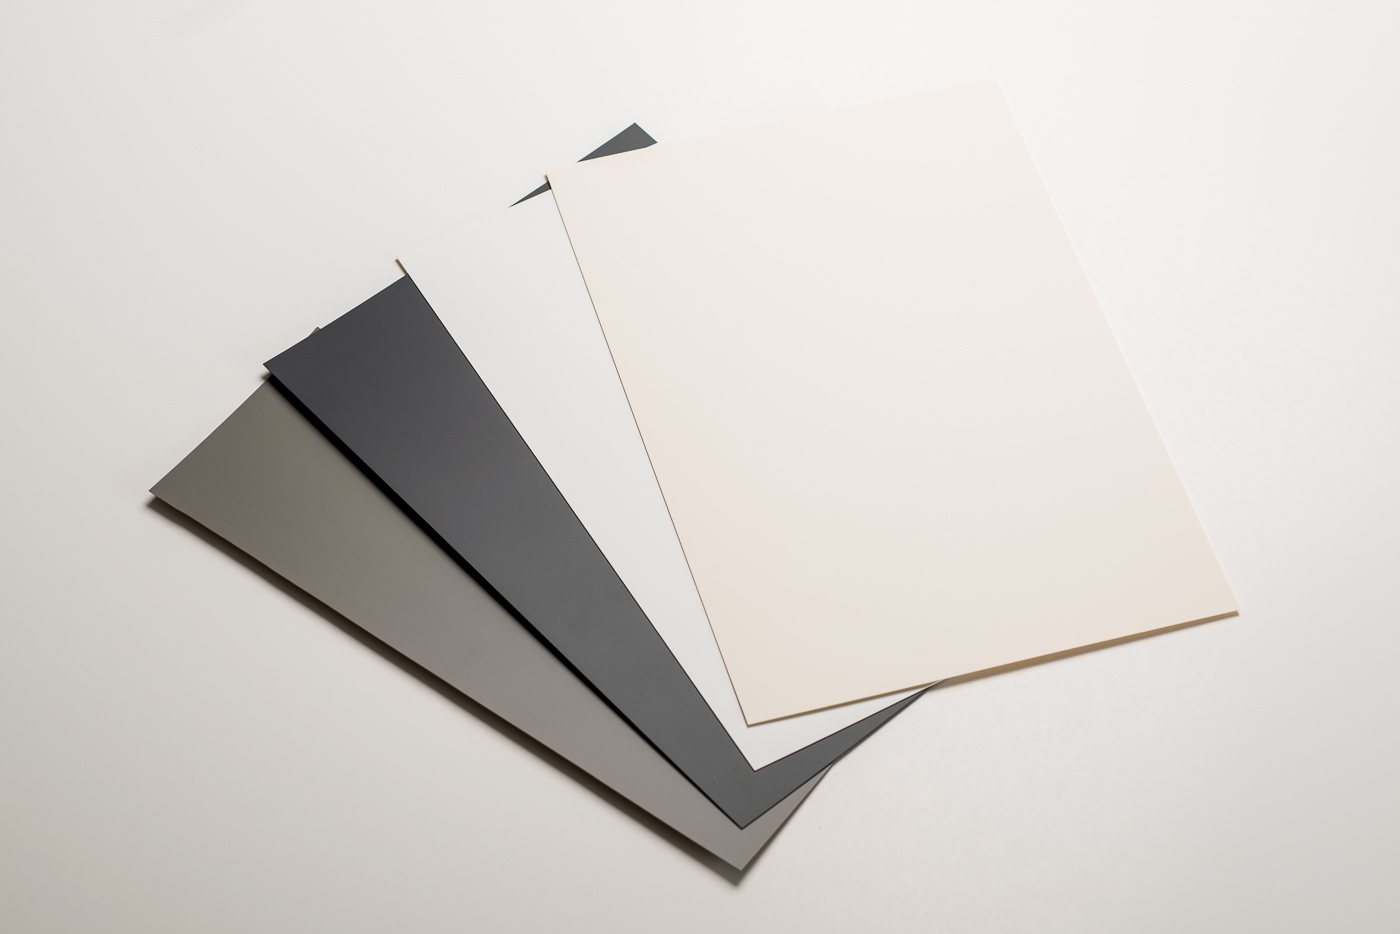 SENOPLAST Colours – Flame Retardant Material